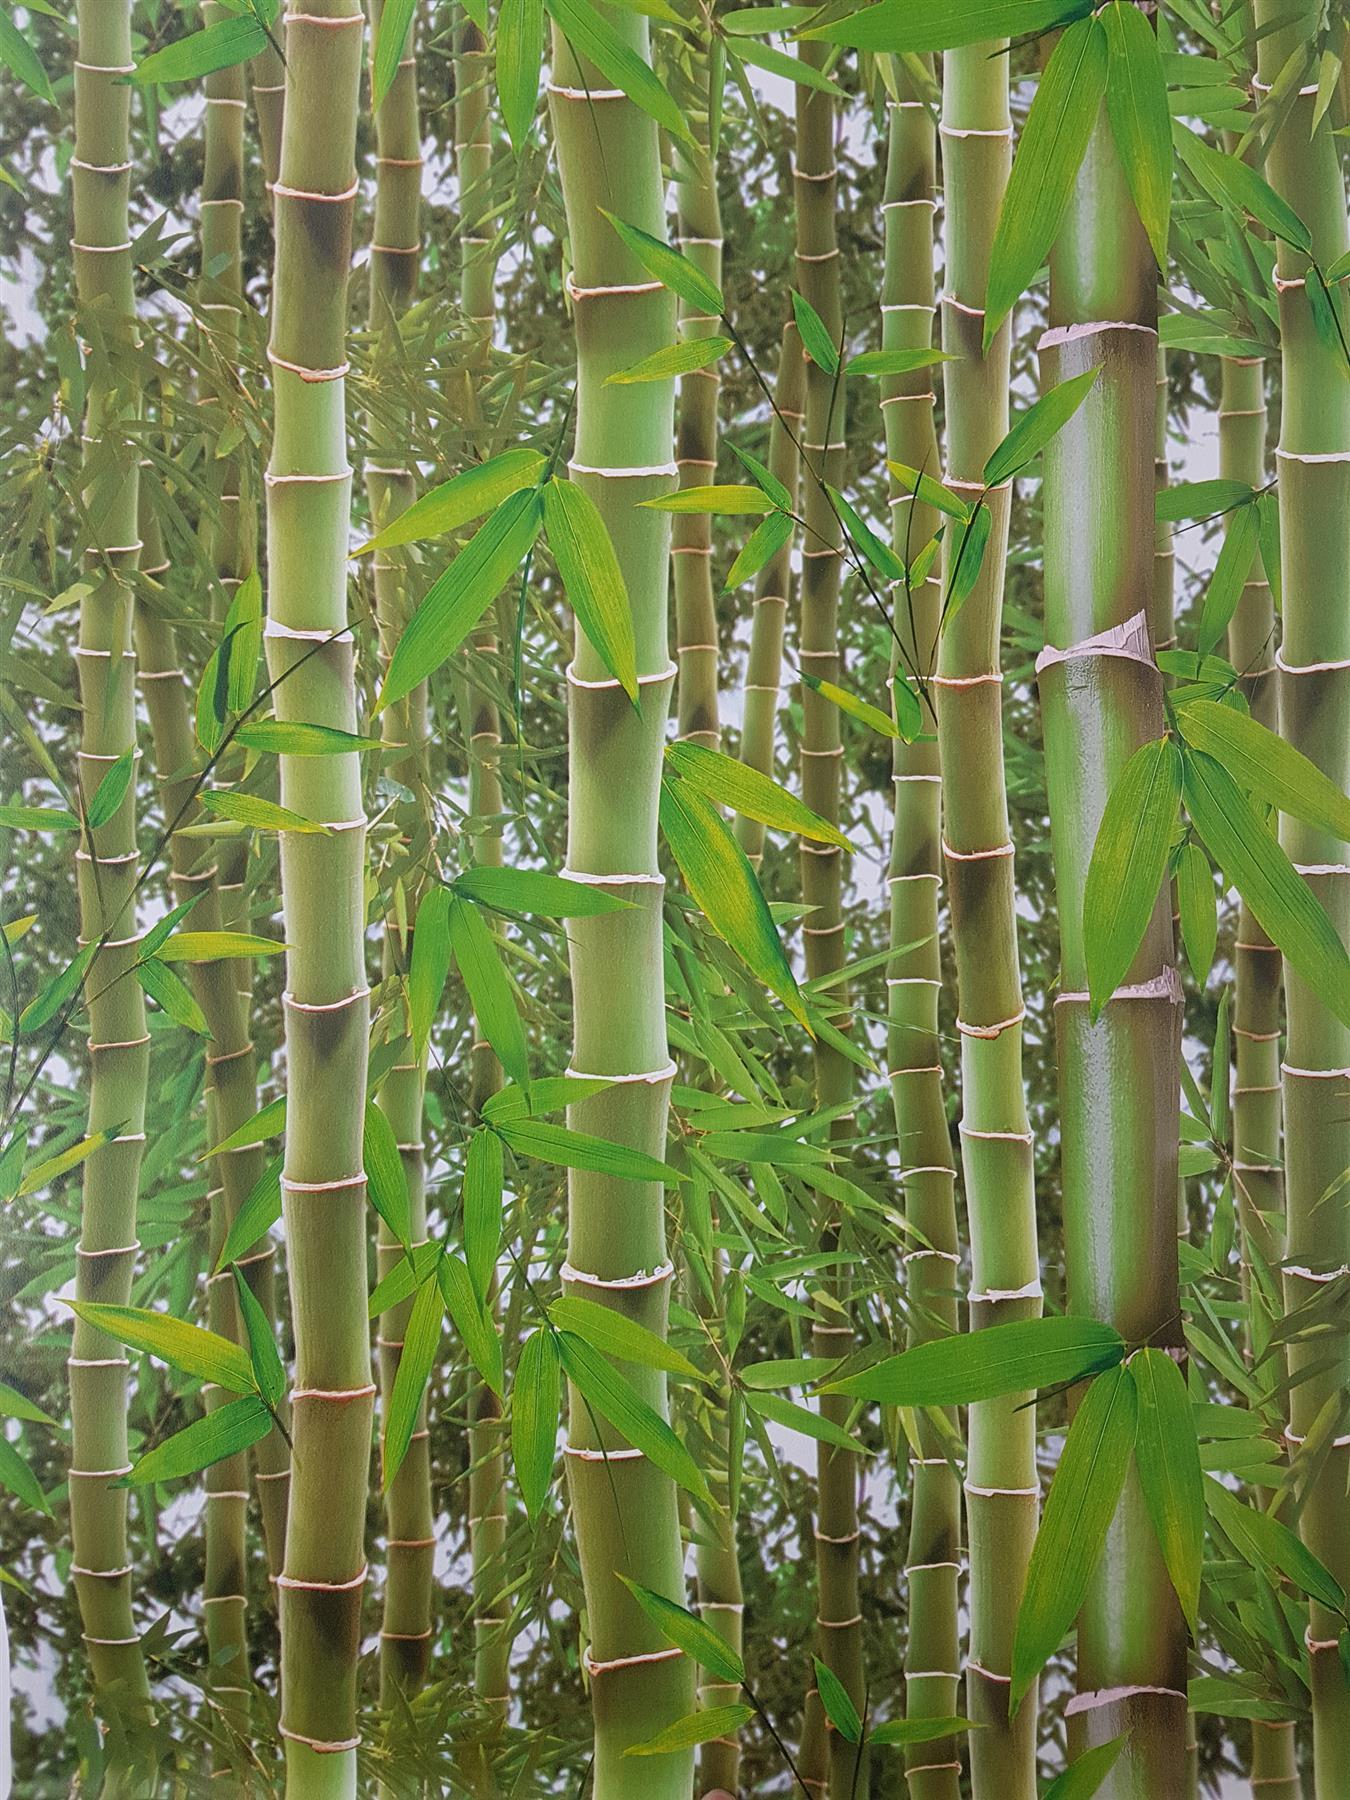 3d Effect Bamboo Forest Photo Mural Wallpaper Jungle Tropical